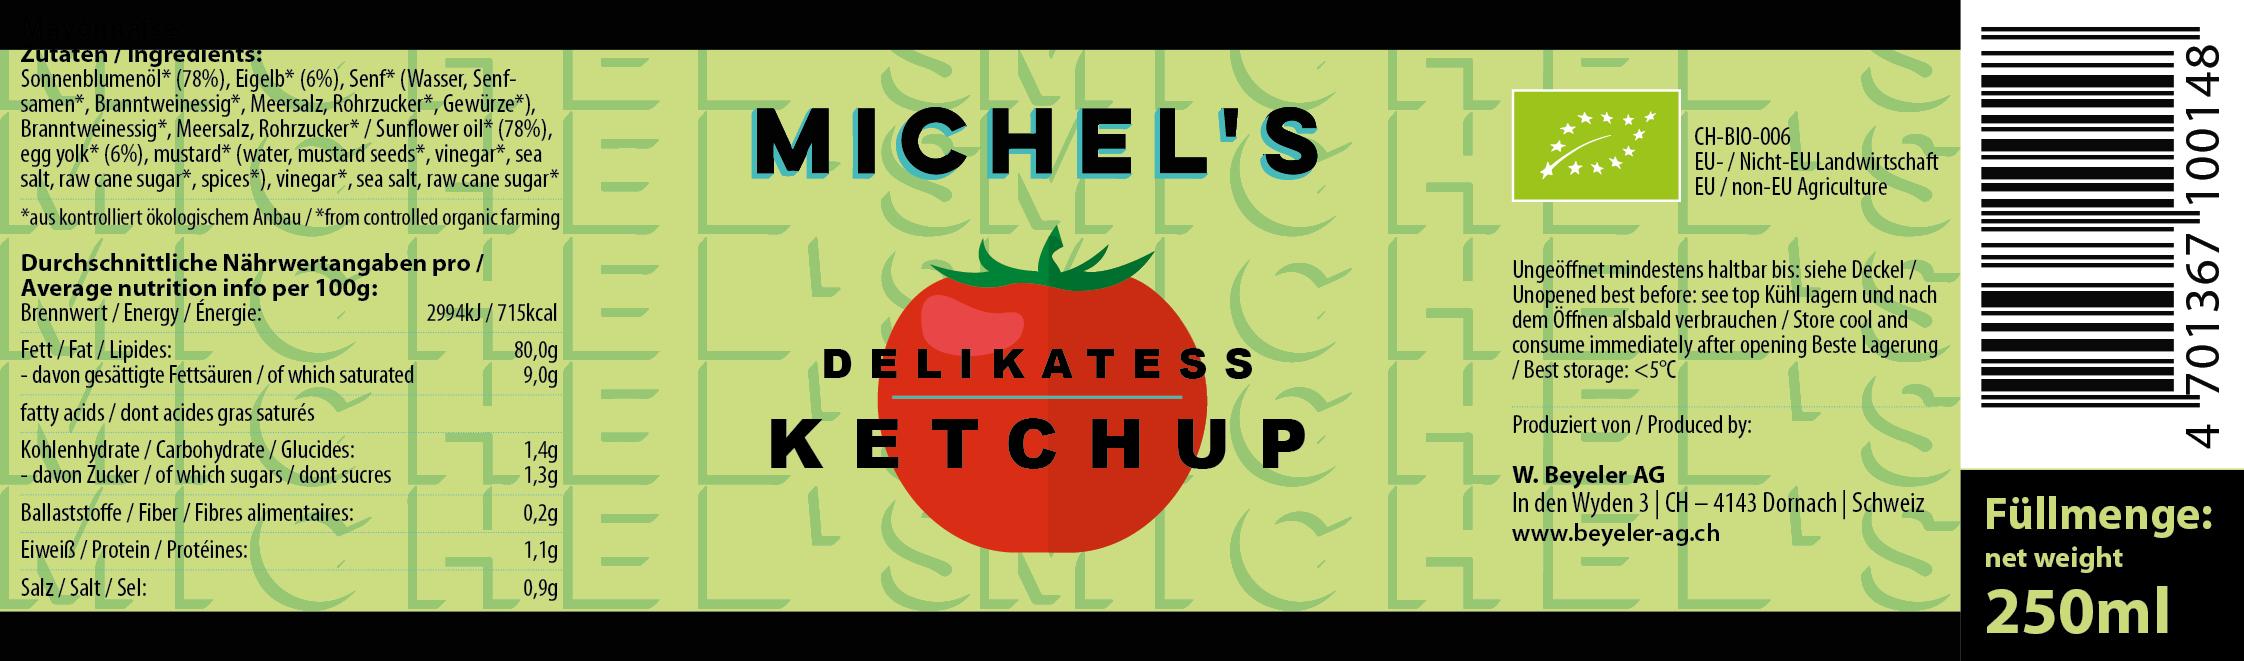 02900218_Michels_Logo_Design_Packaging_Mayonnaise5.jpg